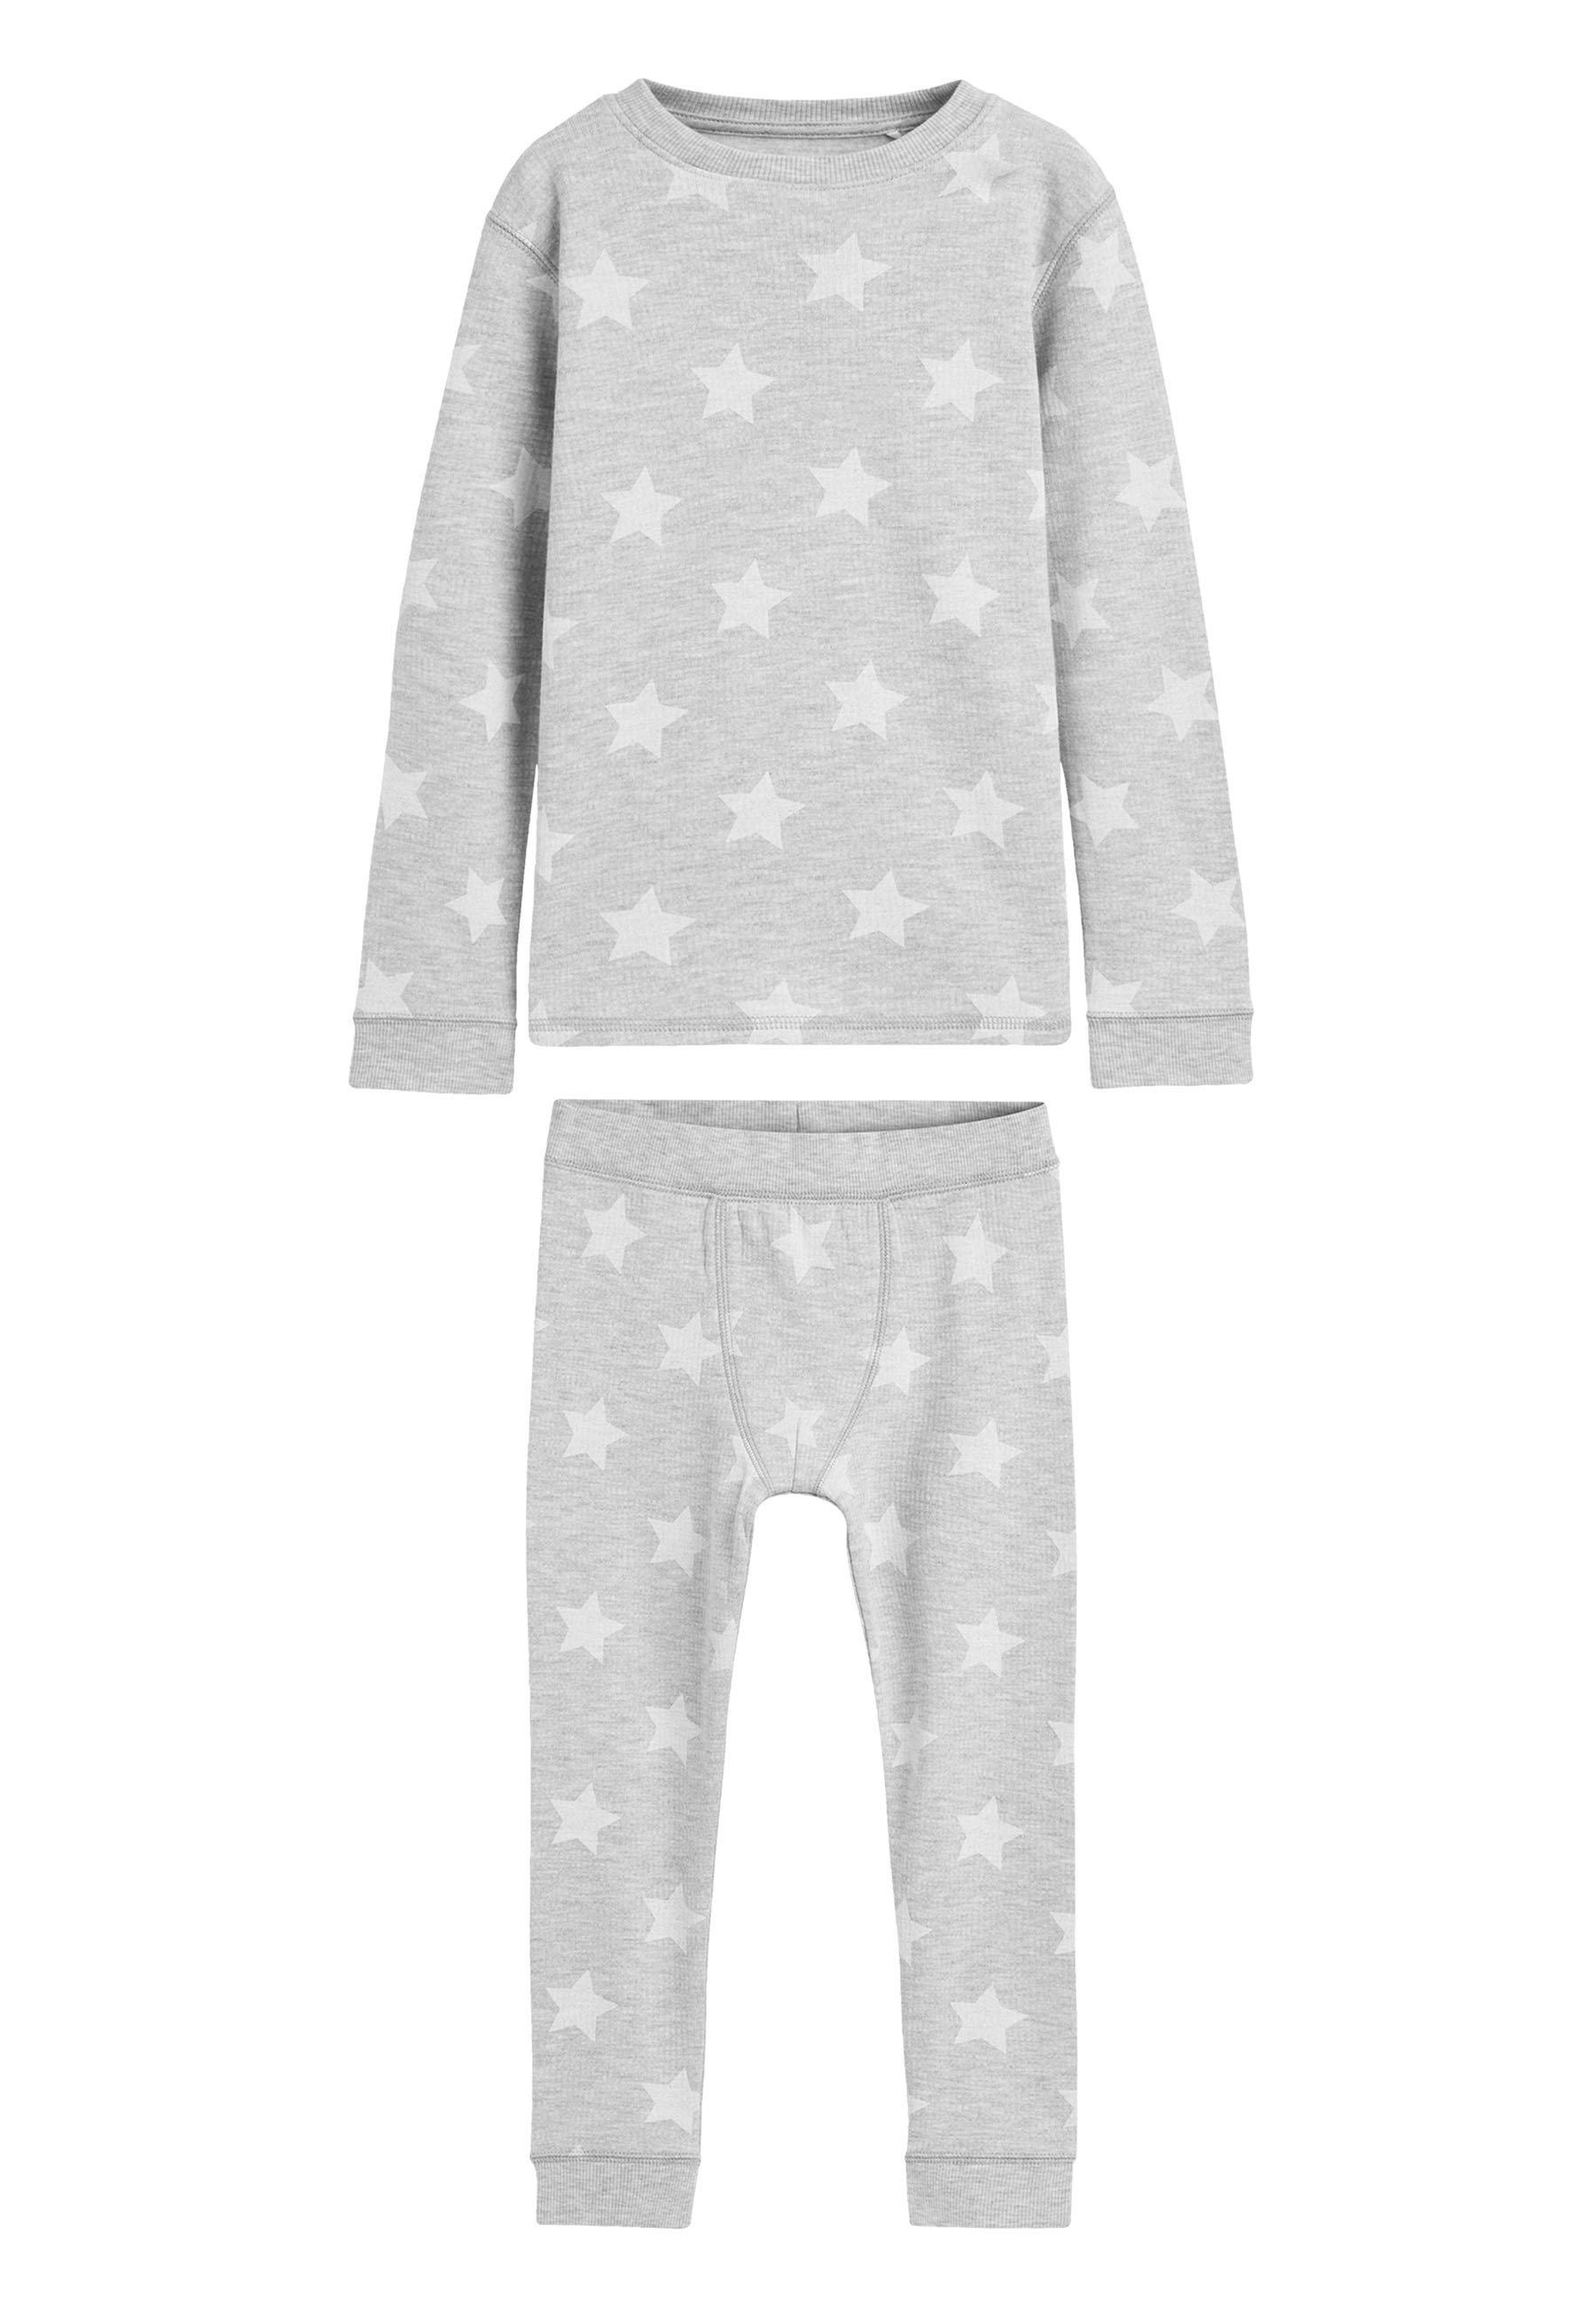 Kinder GREY STAR PRINTED SNUGGLE THERMAL SET (1.5-16YRS) - Nachtwäsche Set